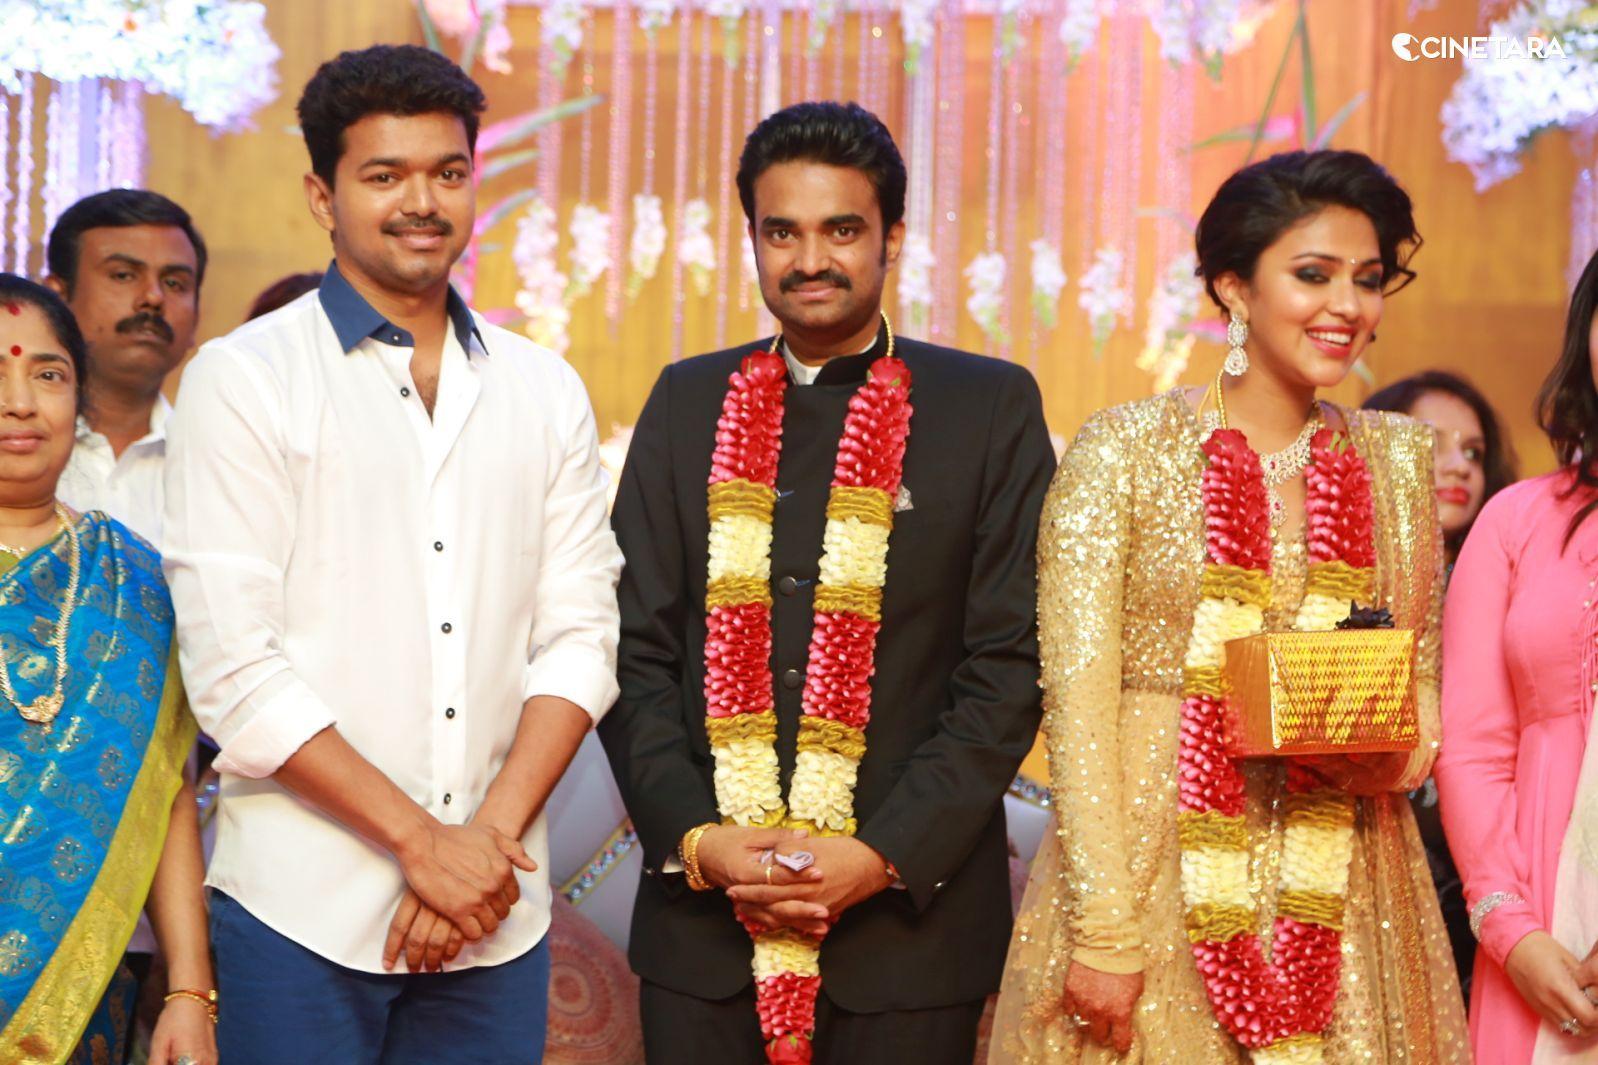 Rewind Of The Fav Celebs Wedding On Your Mind Amala Paul Vijay Ezwed